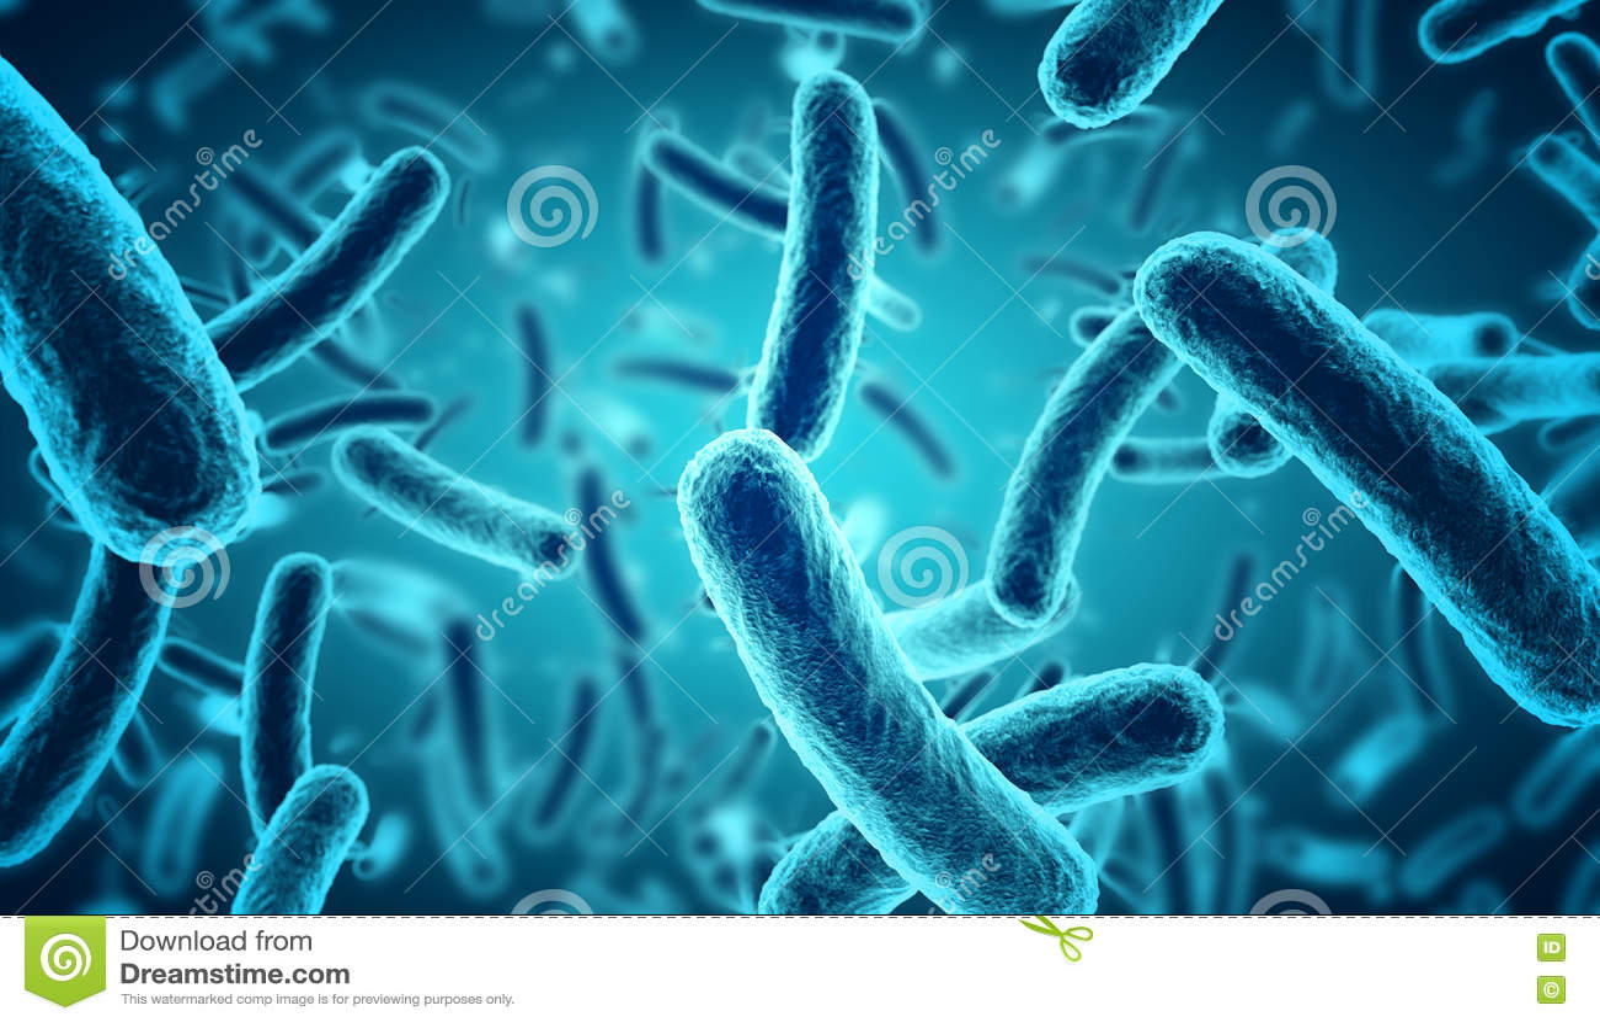 Blauwe bacteriën